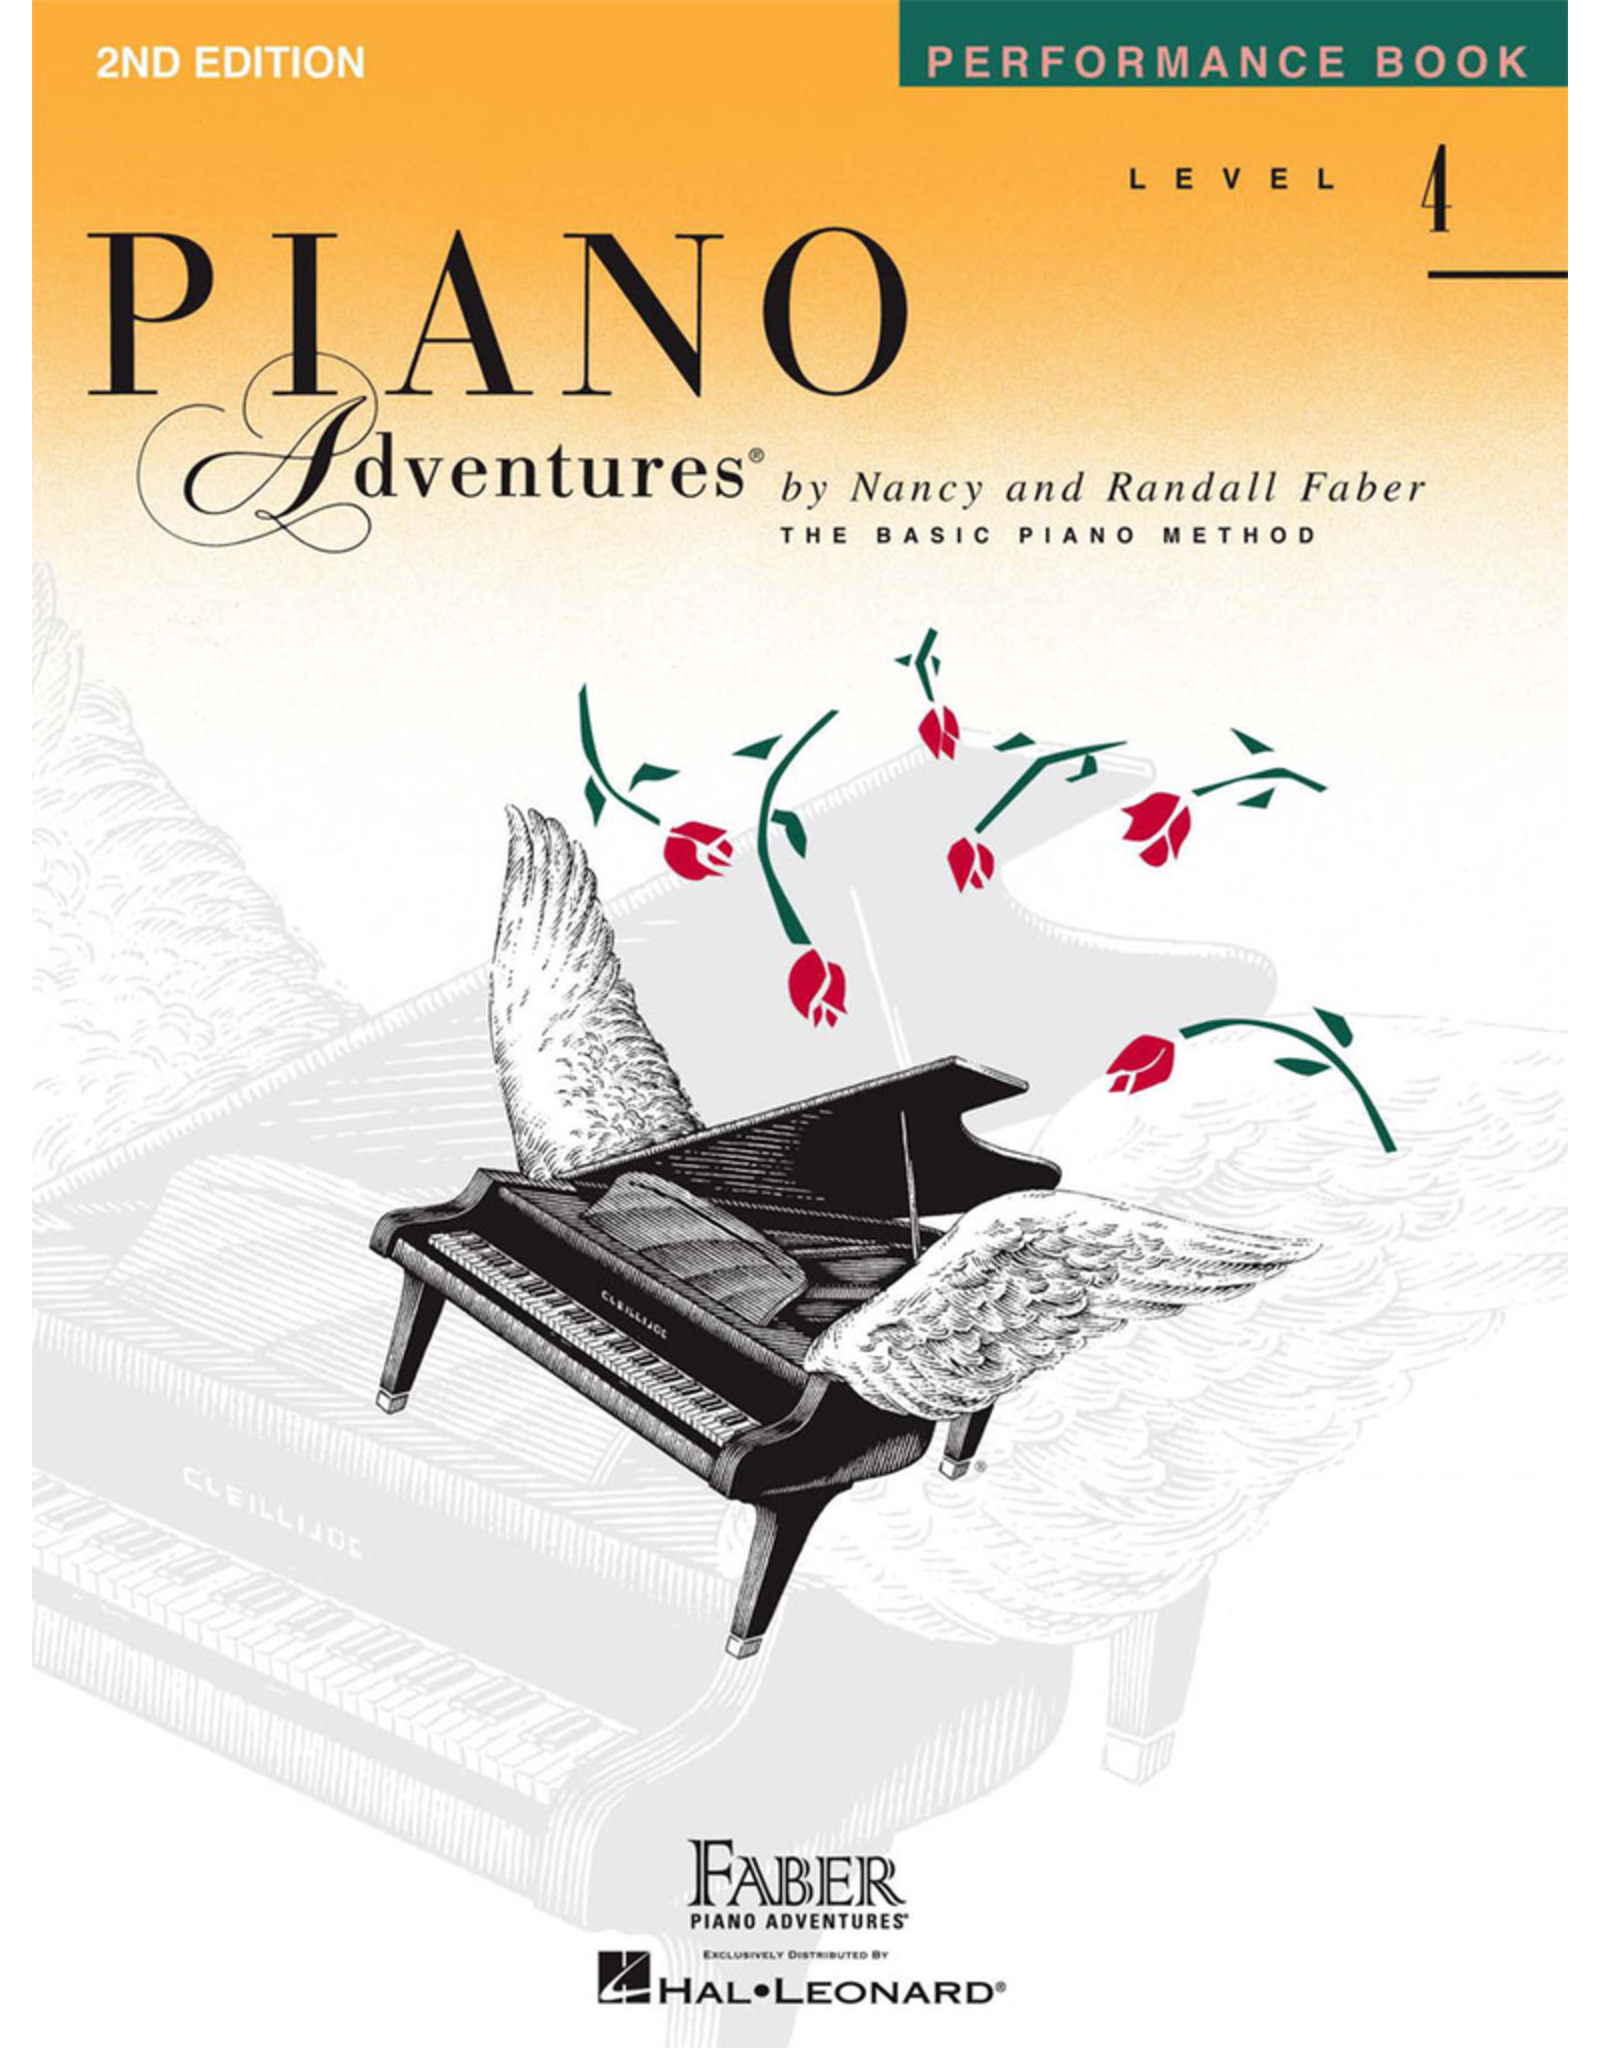 Hal Leonard Piano Adventures Performance Book Level 4